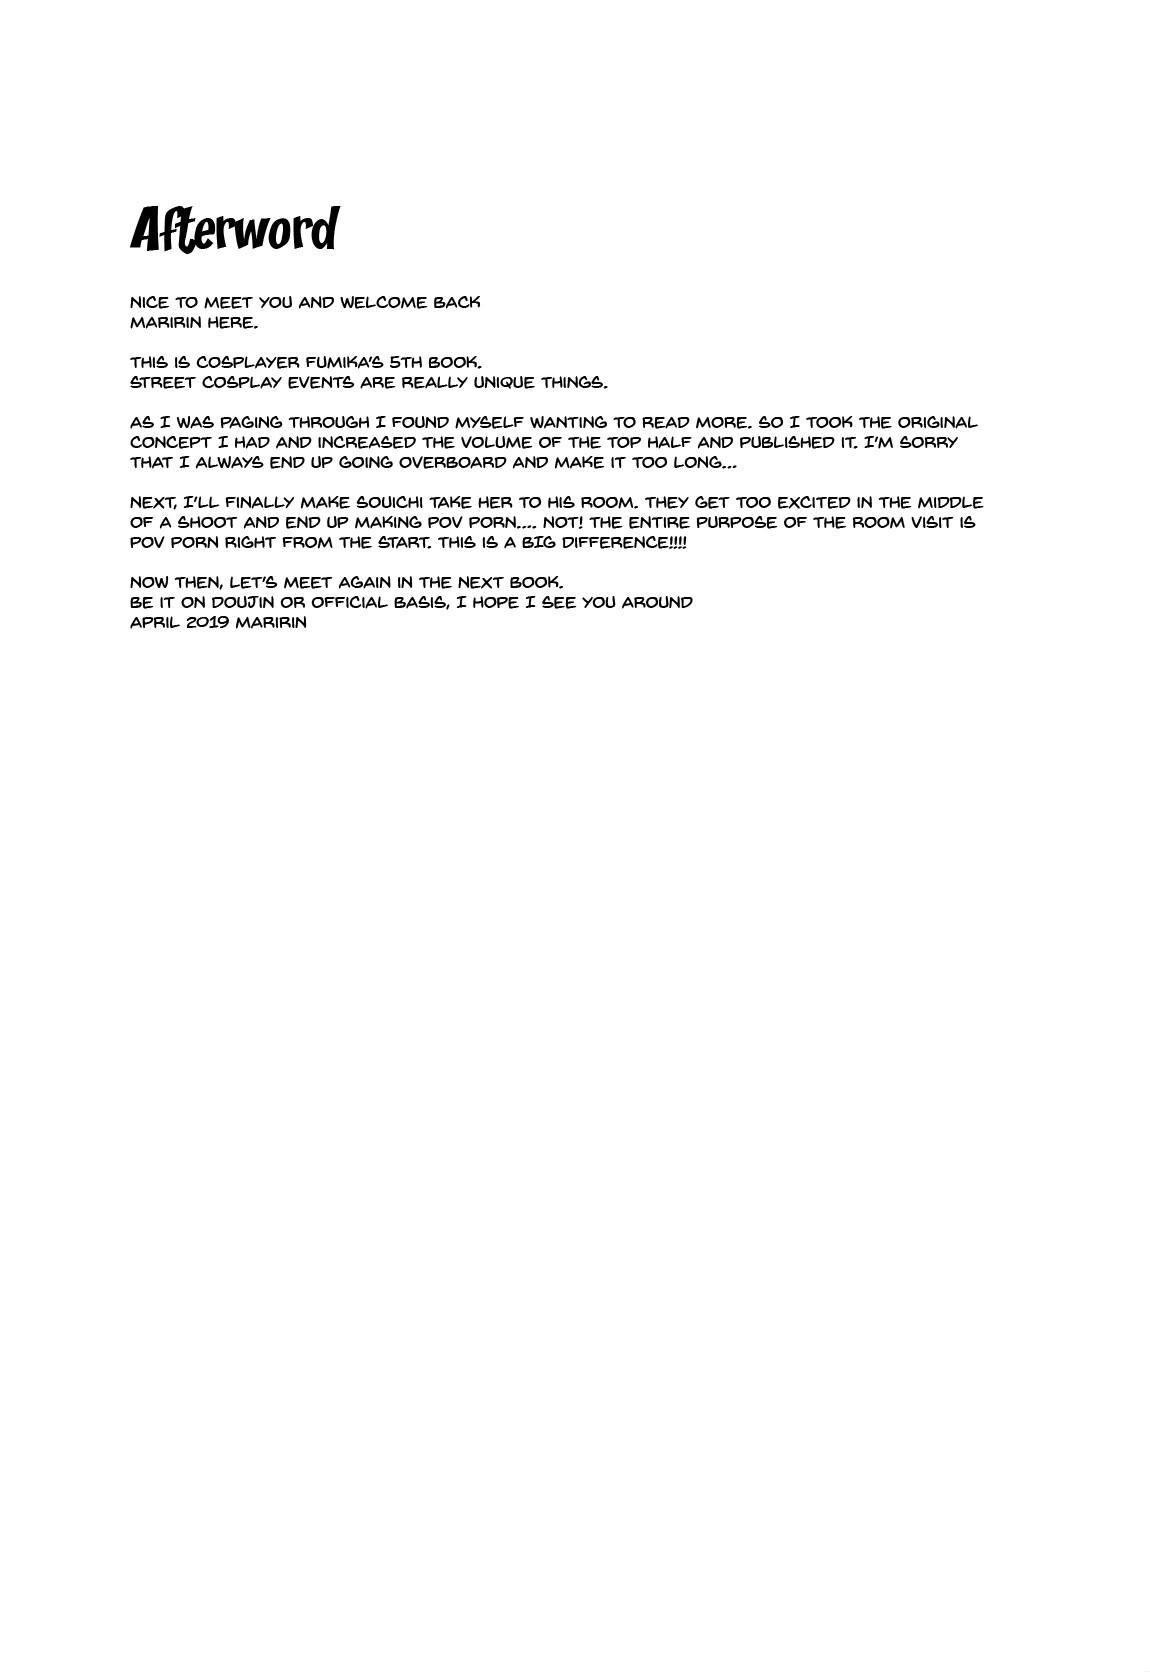 (COMIC1☆15) [SSB (Maririn)] Purupuru Yurasu H-Cup Namachichi Hobo Marudashi Layer Icha Love Rojou CosEve Date | making love to a cosplayer with large swaying h-cup breasts at a cosplay event (Fate/Grand Order) [English] {Doujins.com} 19